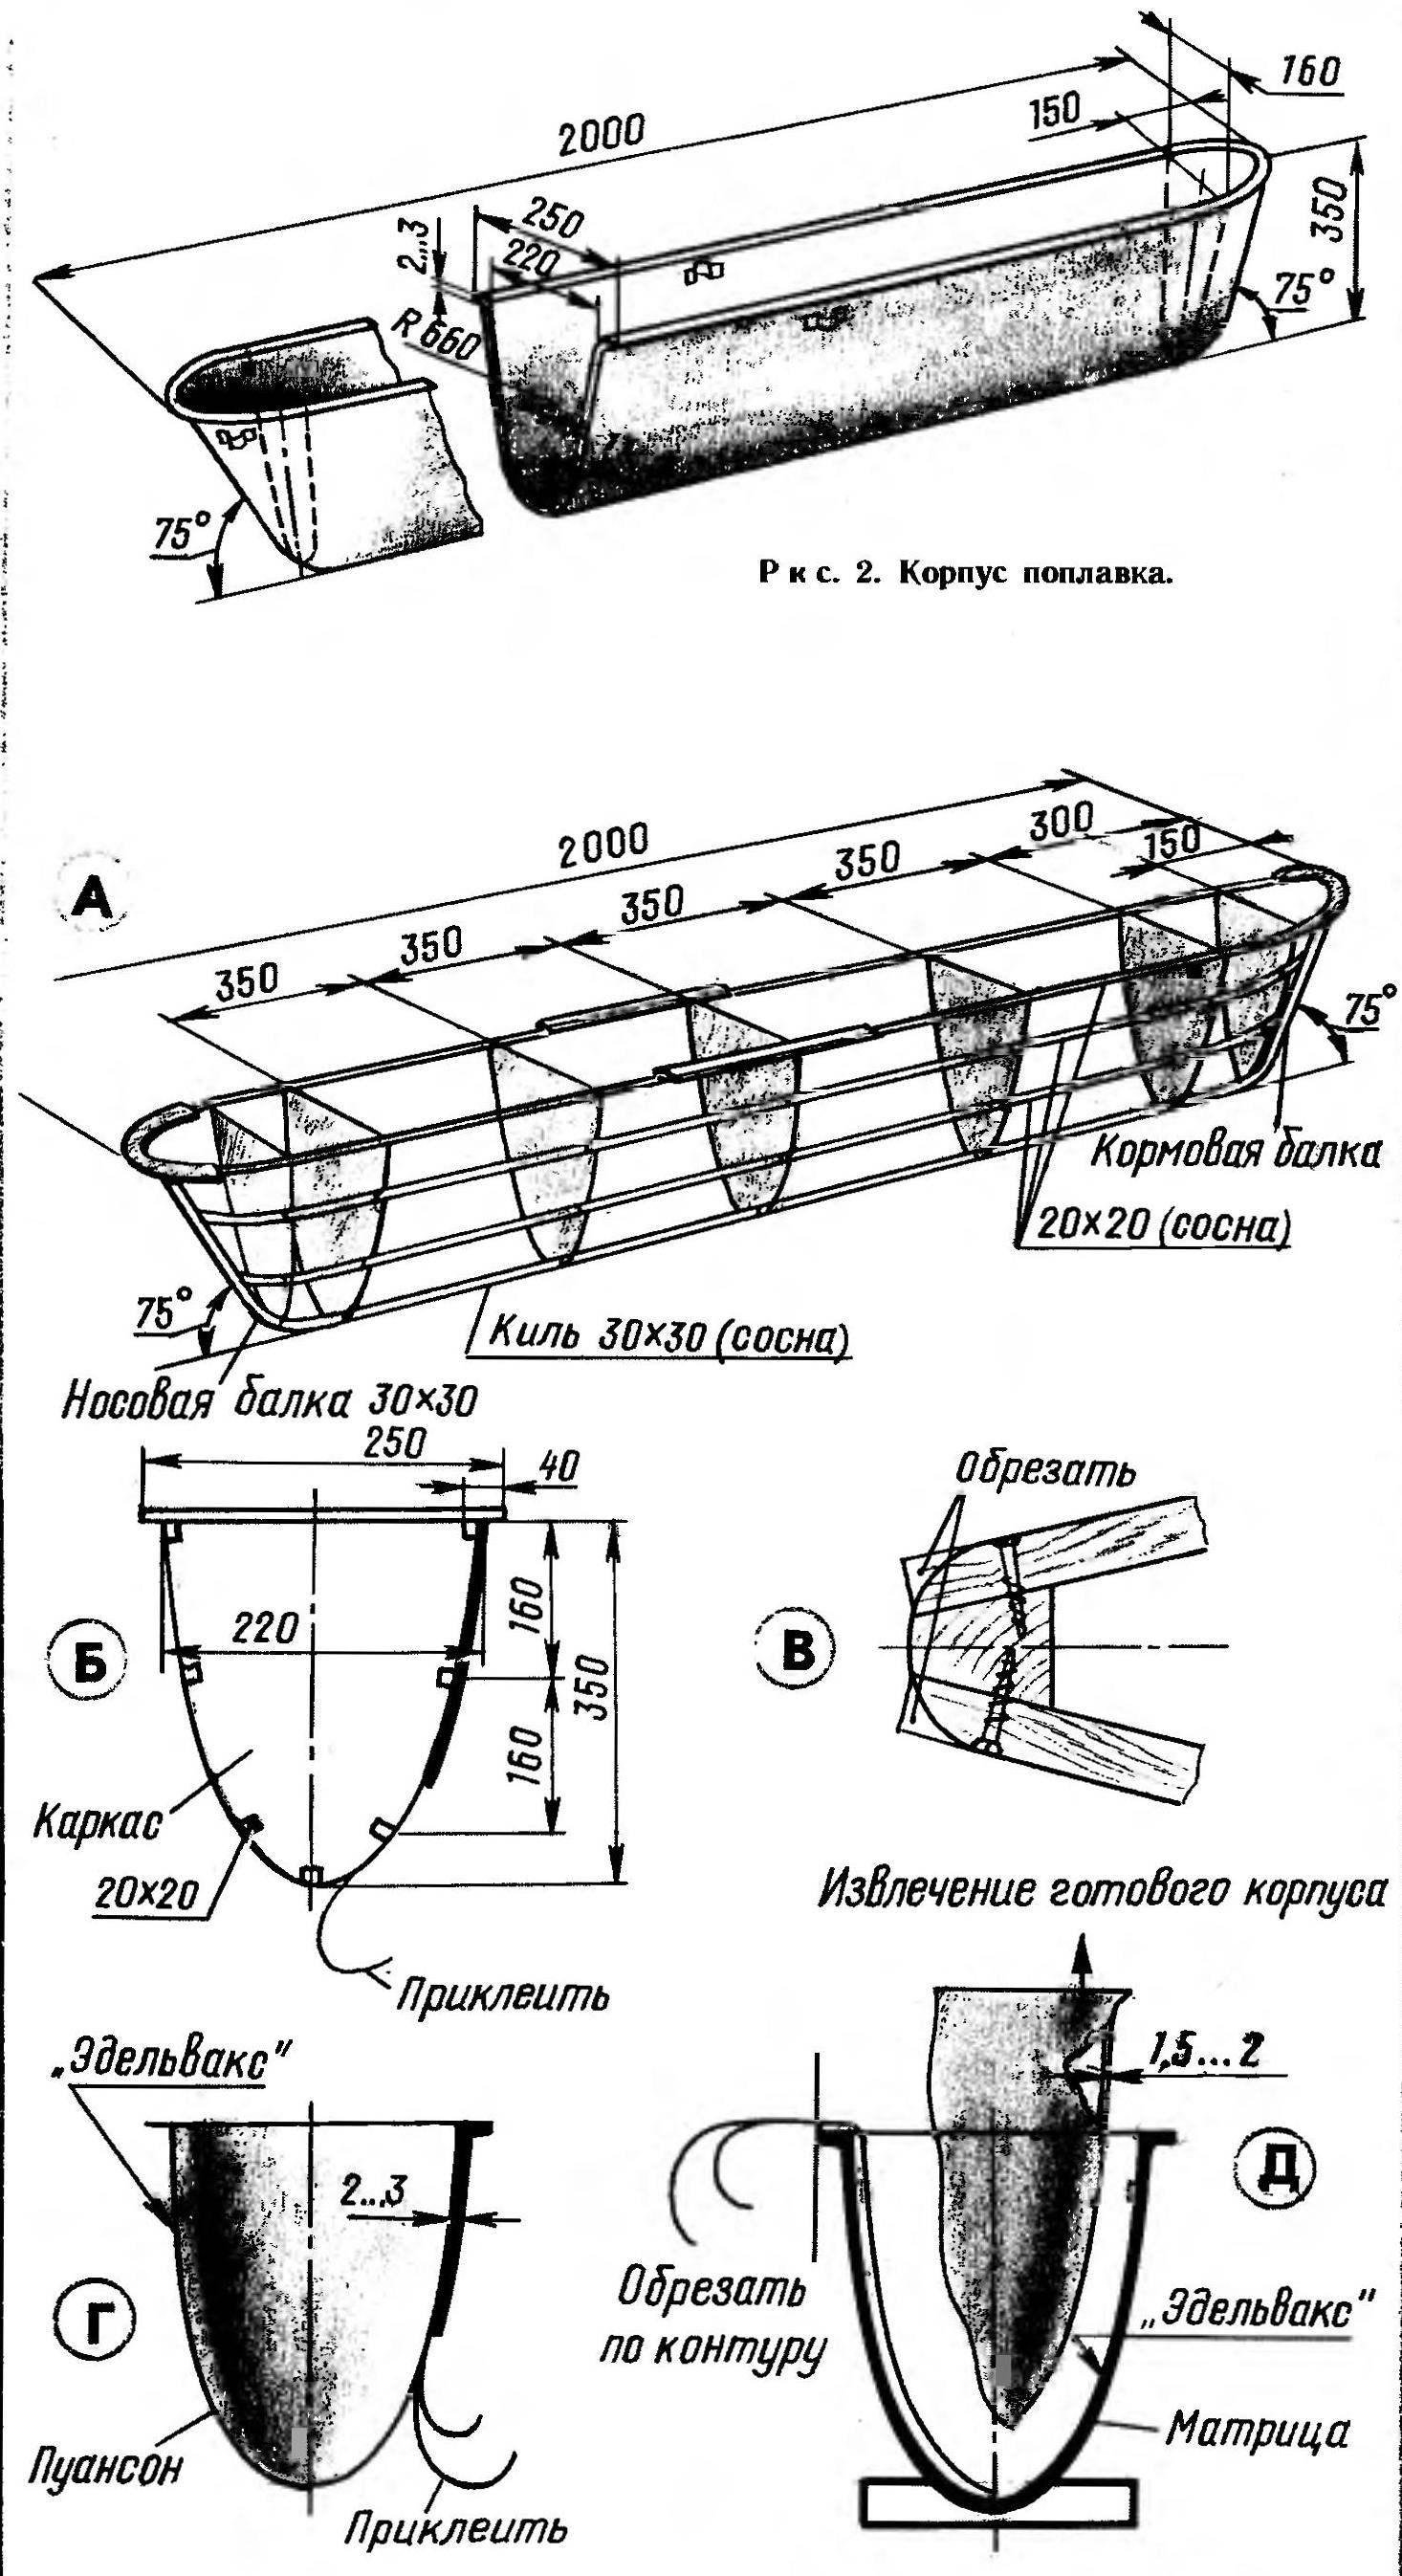 Р и с. 3. Технология изготовления корпуса поплавка